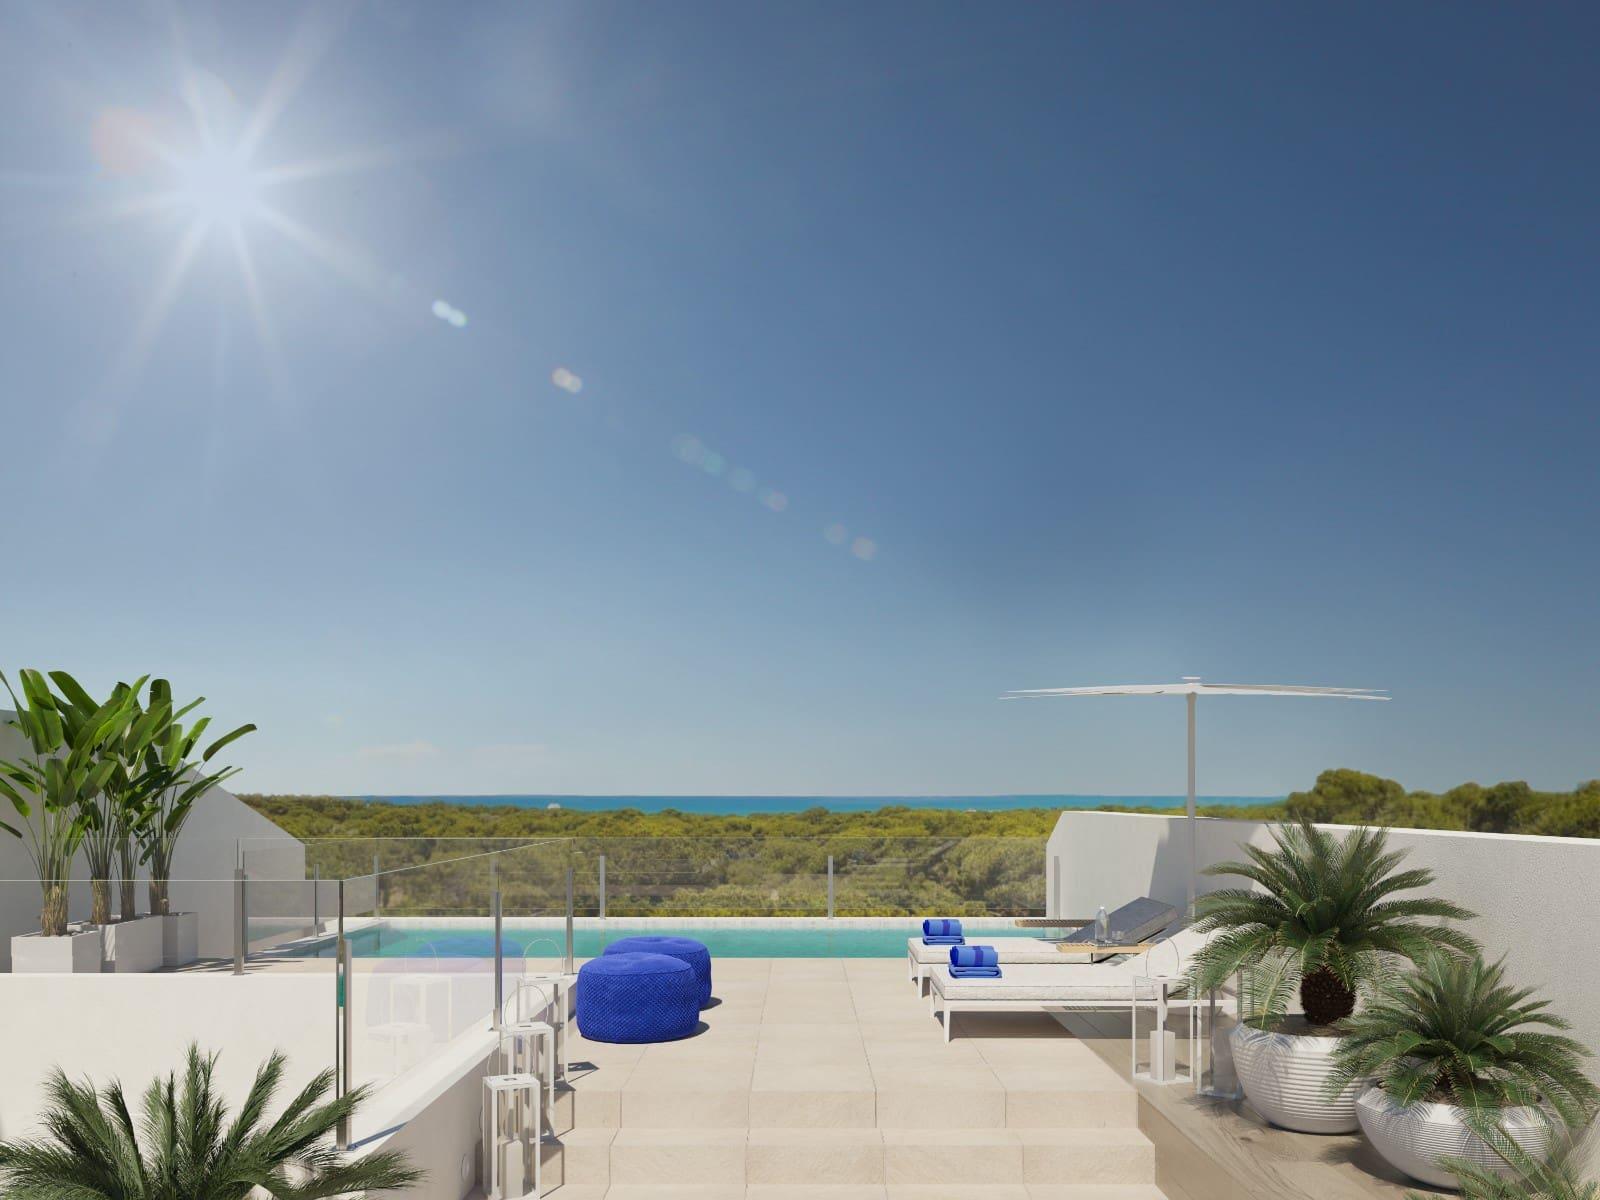 3 bedroom Apartment for sale in Guardamar del Segura with pool - € 248,000 (Ref: 4755411)